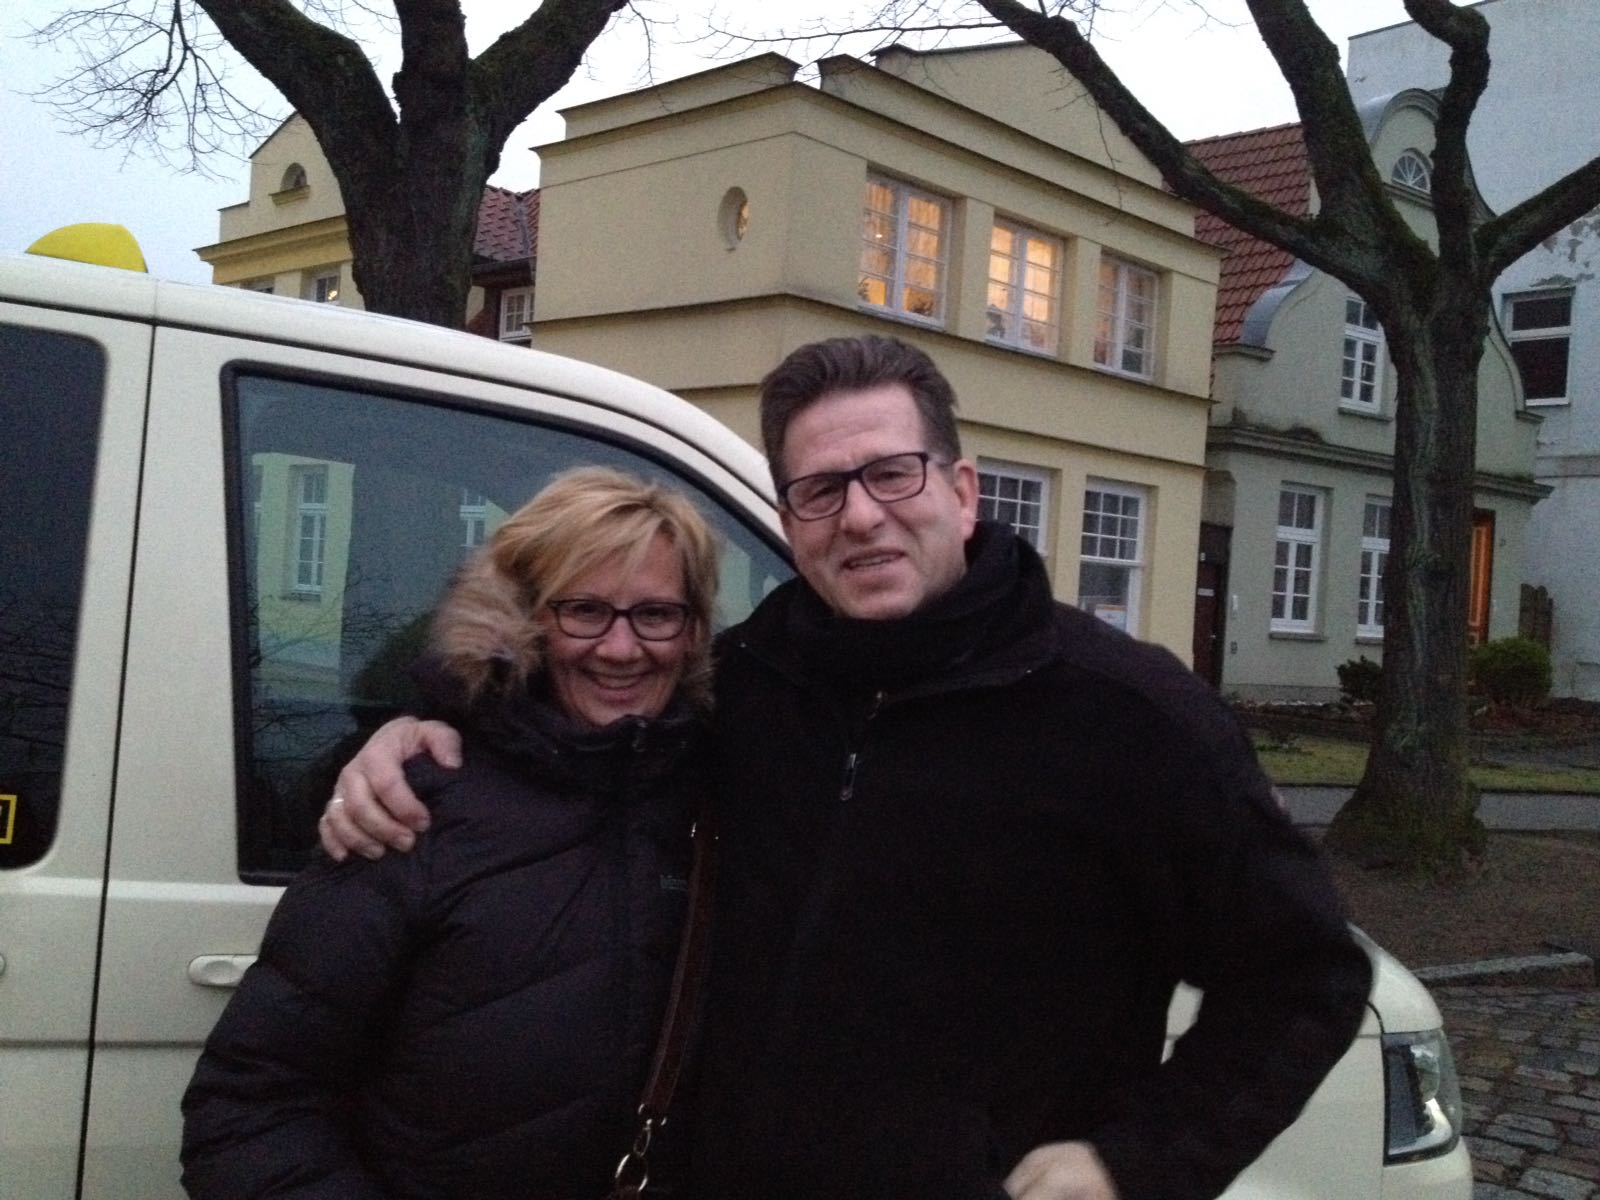 Taxi Rostock Ehrenamtler aus Greifswald